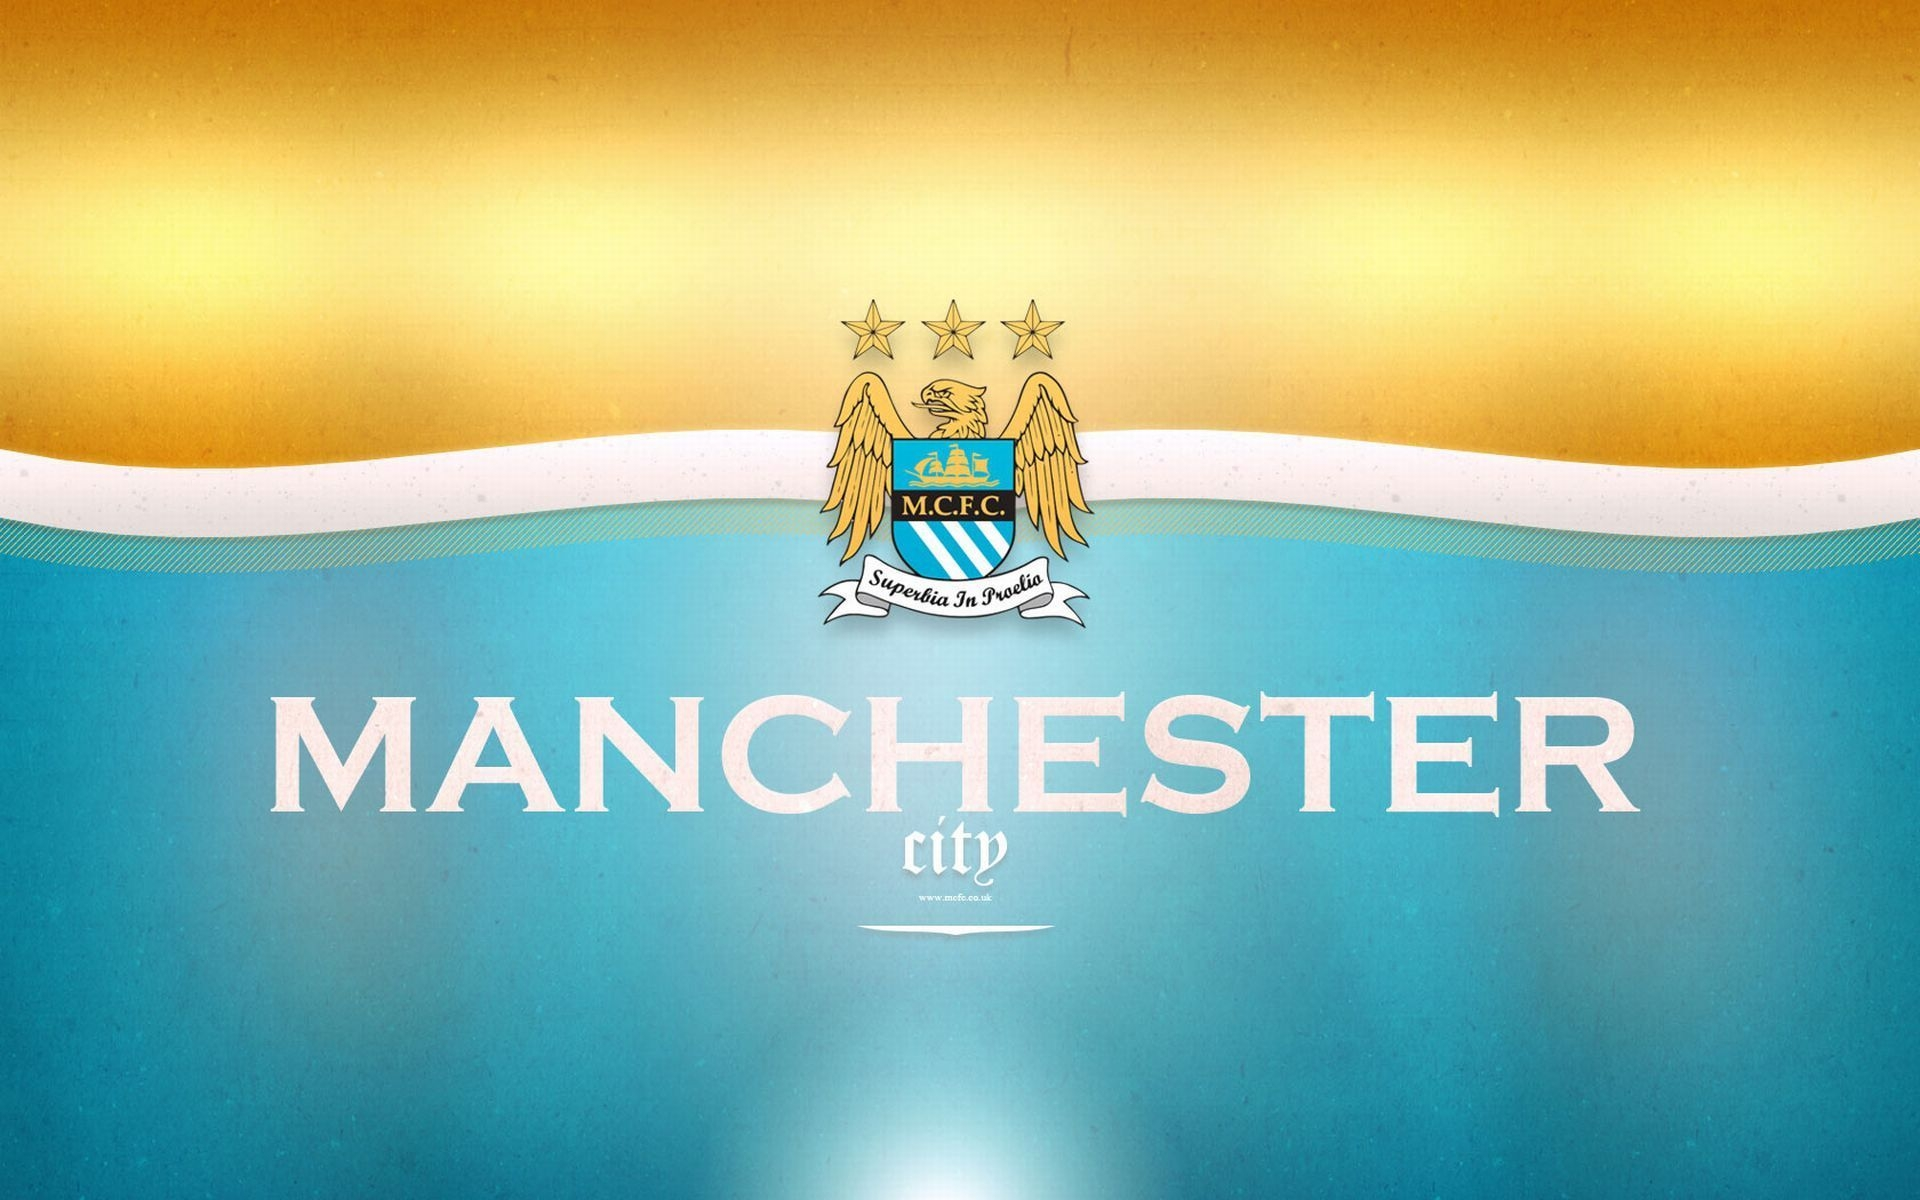 Картинки Манчестер, Великобритания, футбол, город, англия фото и обои на рабочий стол